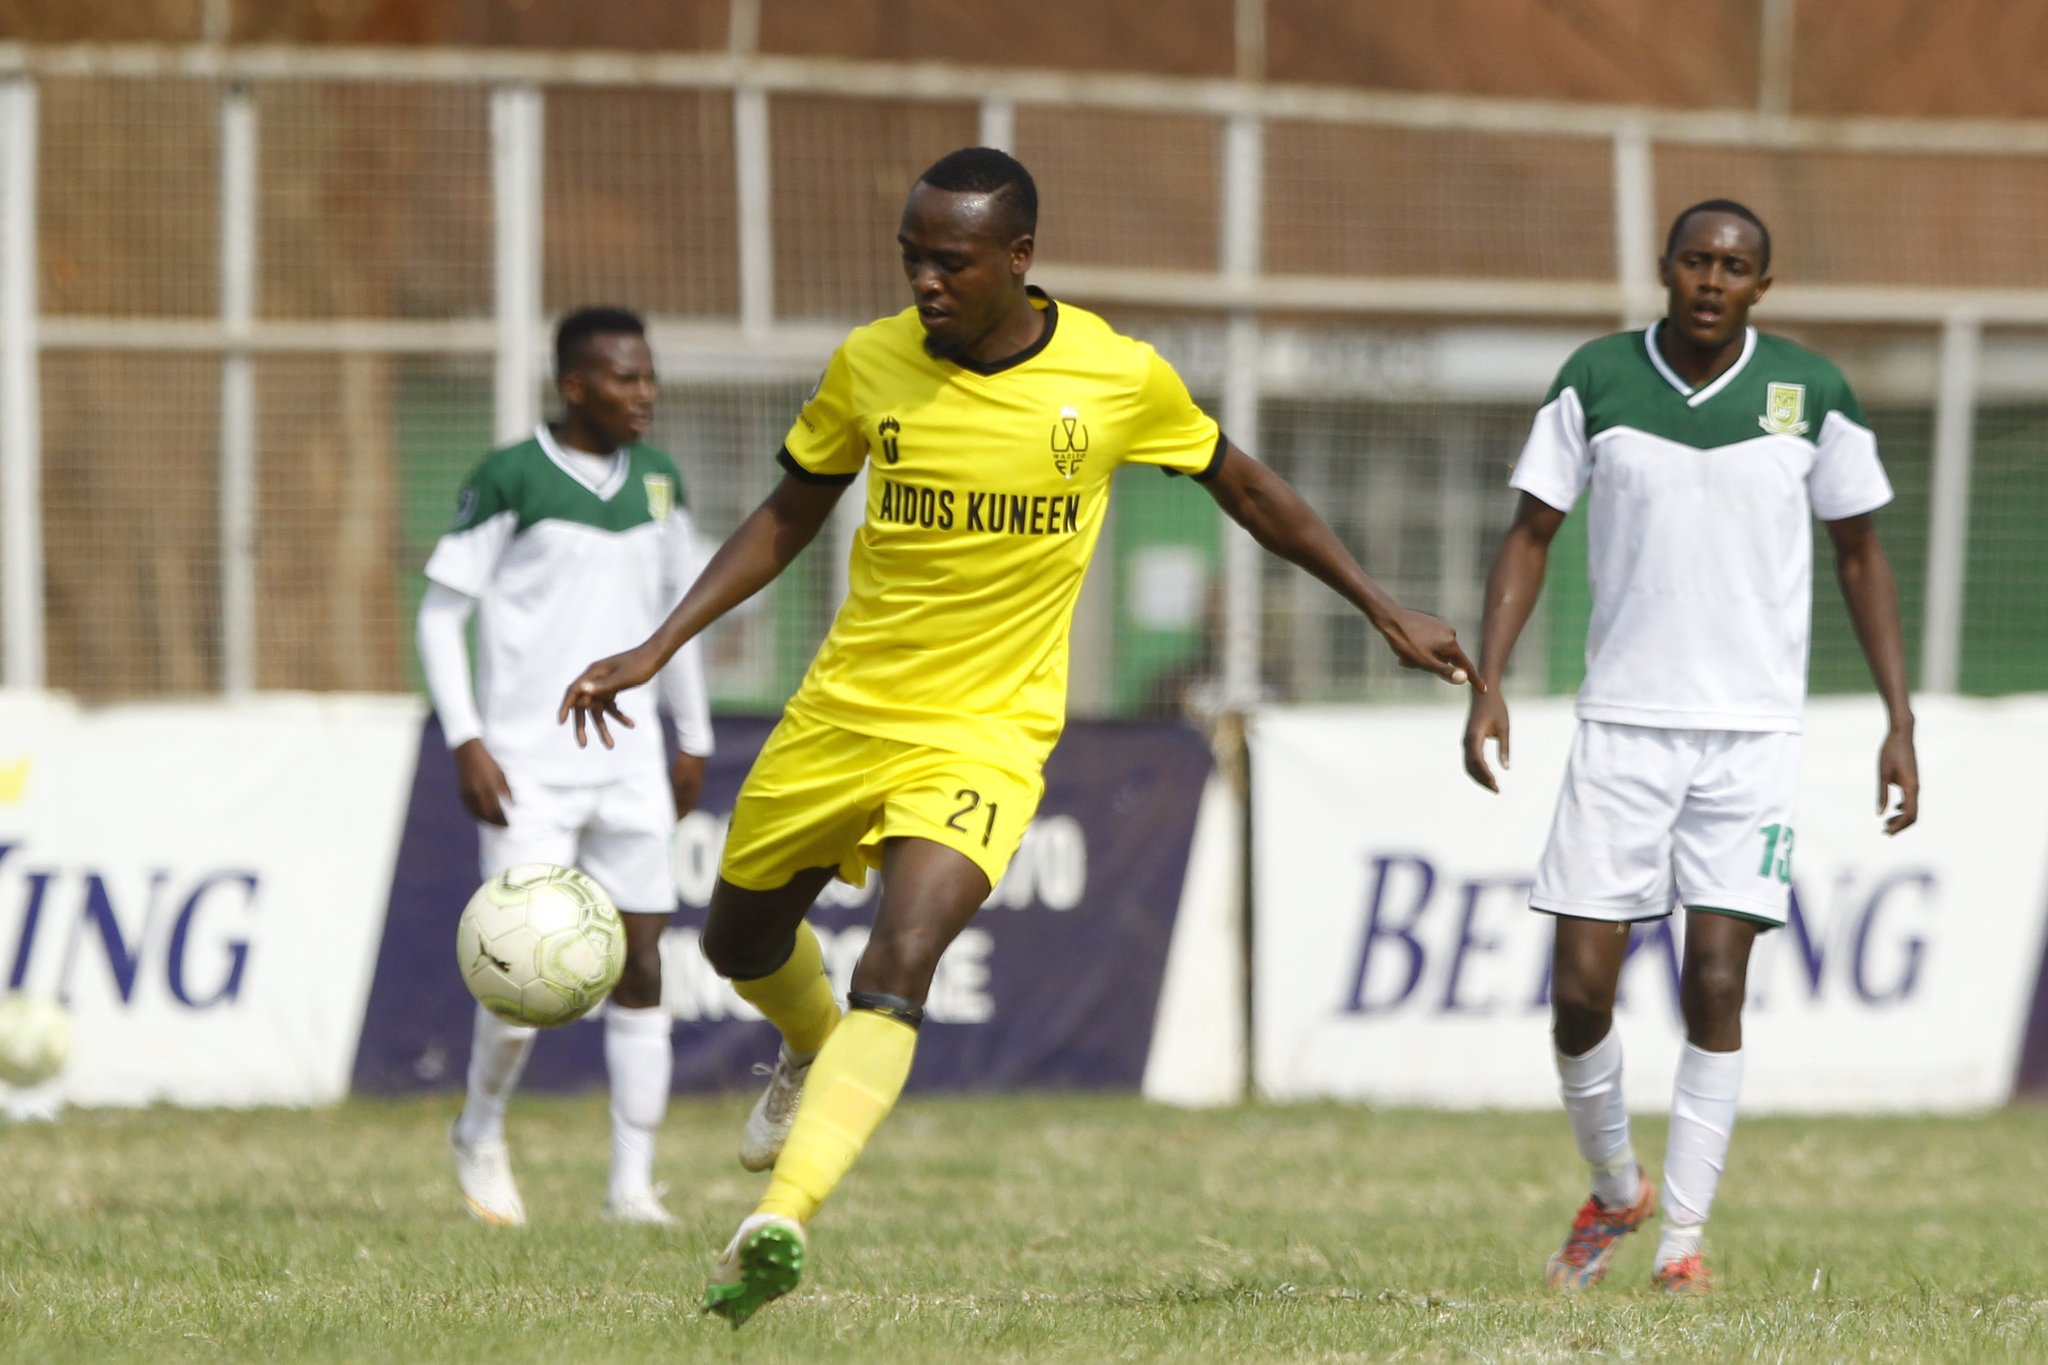 Super Sub Oburu Compounds Mathare United's Relegation Woes